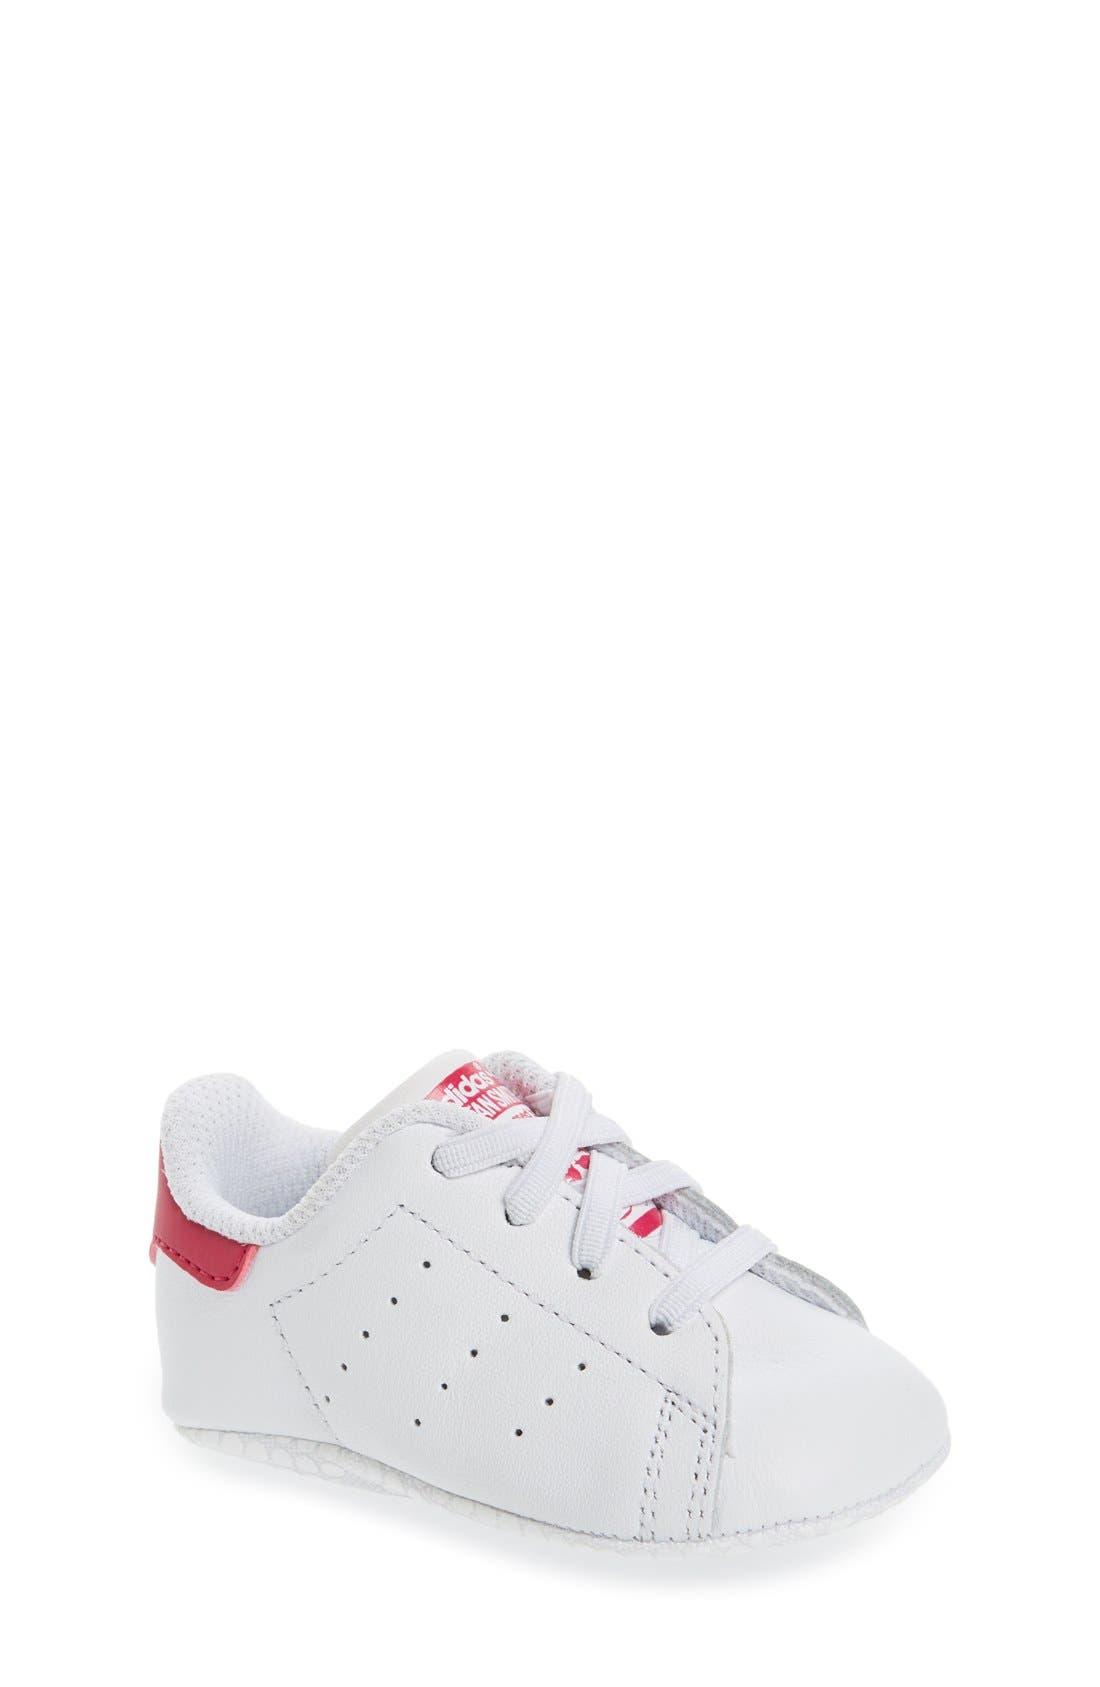 'Stan Smith' Crib Sneaker,                             Main thumbnail 1, color,                             White/ White/ Pink